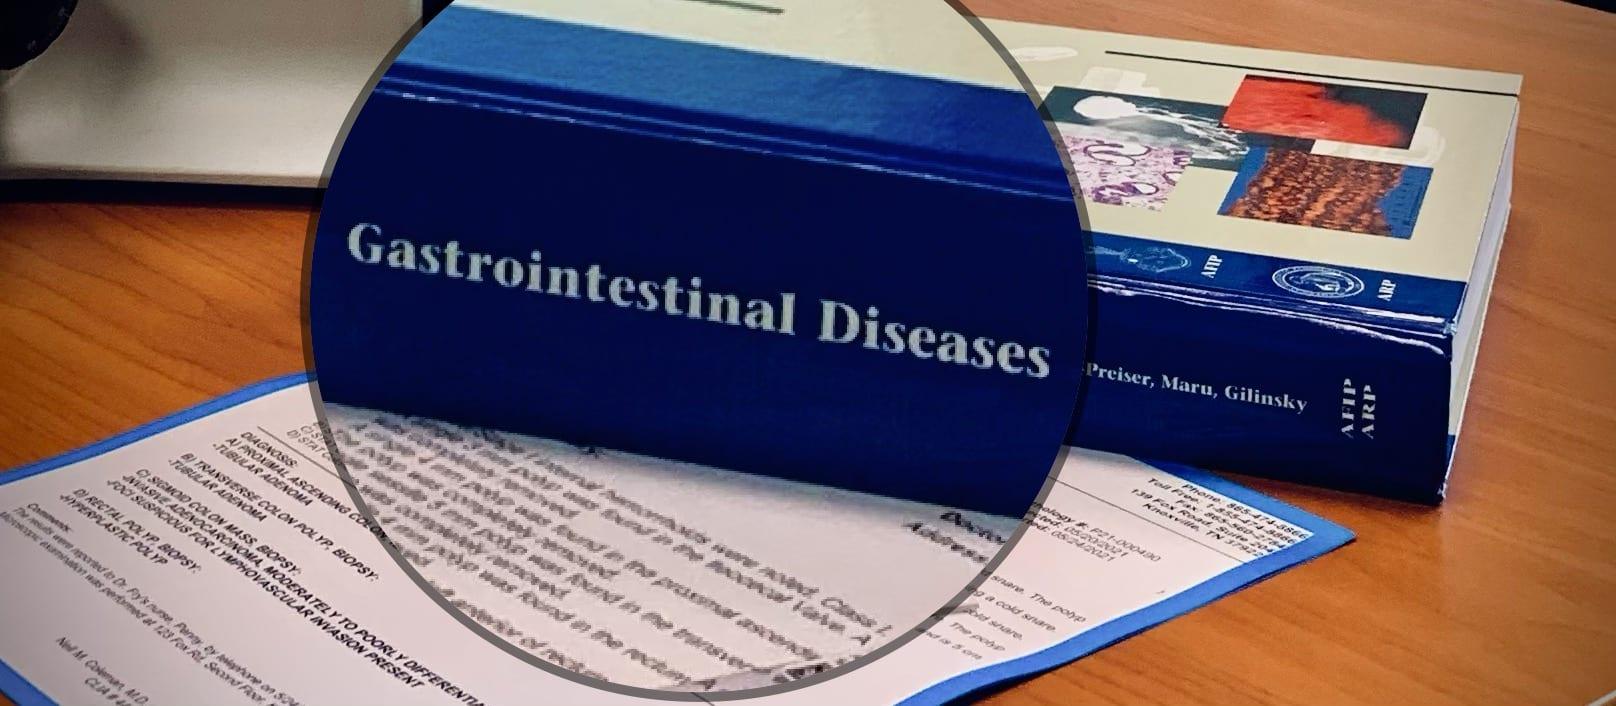 gastrointestinal disease textbook